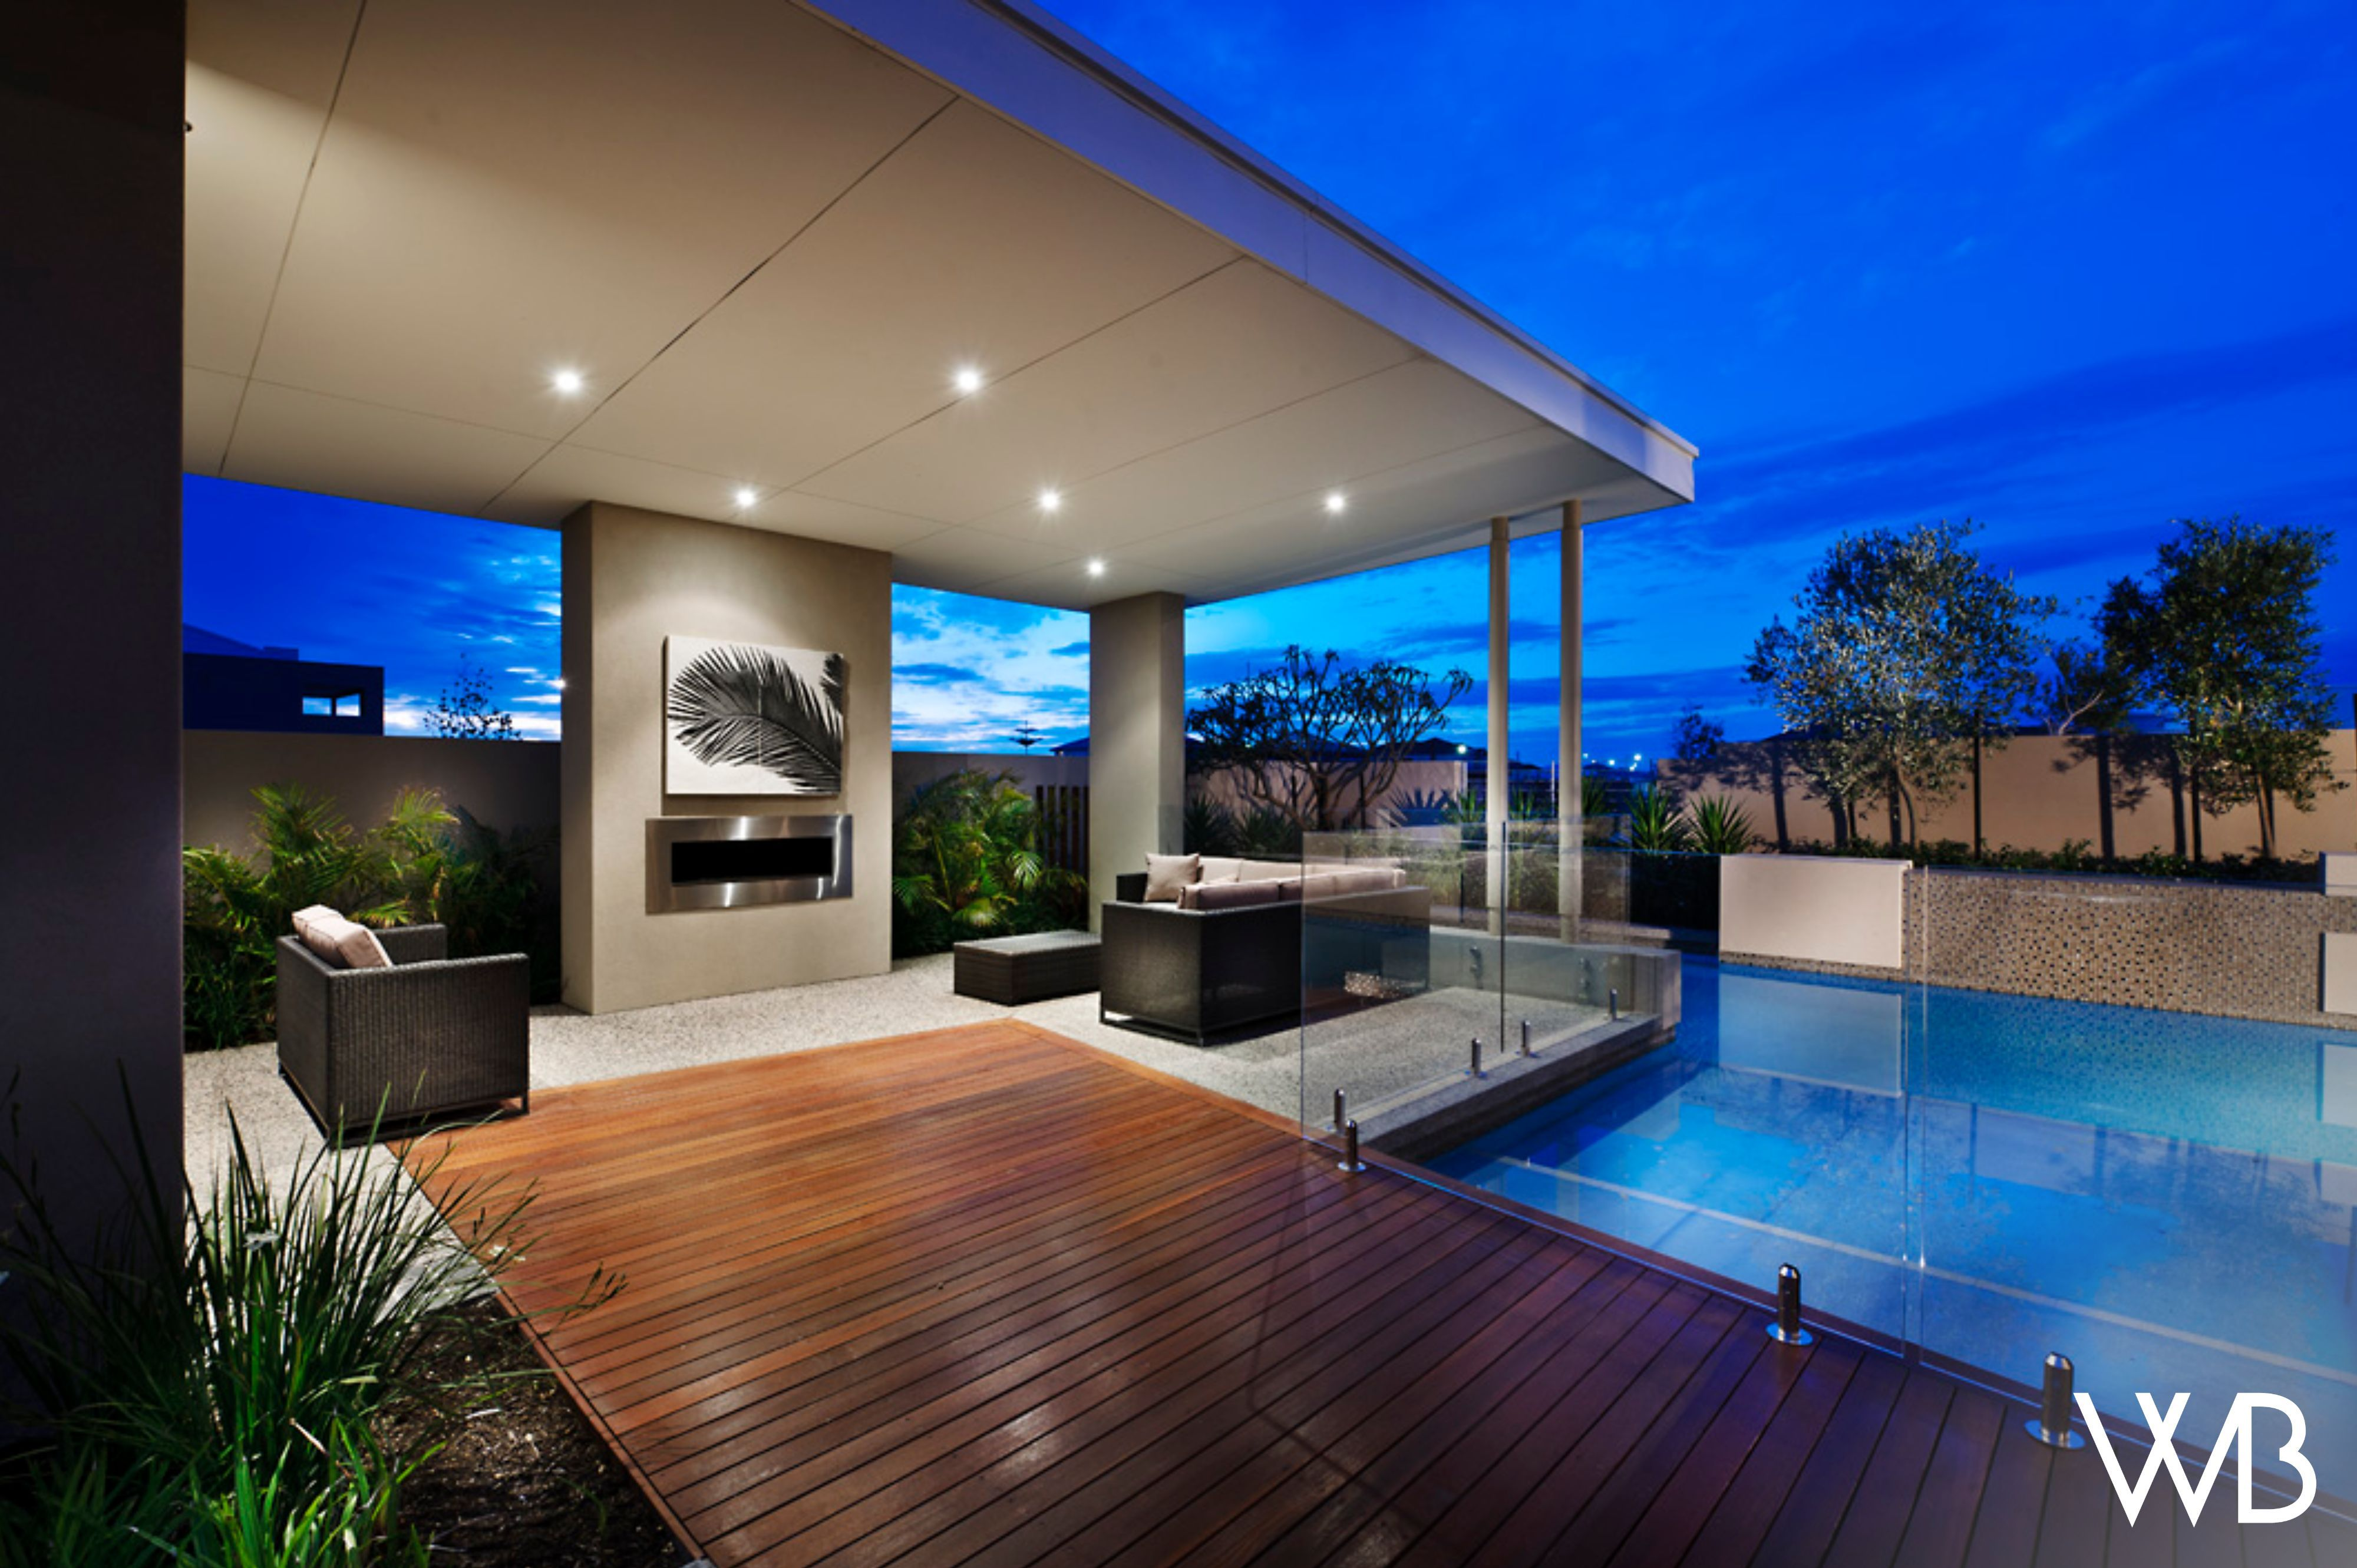 Pin By Matt Bailey On Outdoor Area Modern Pools Backyard Pool Designs Pool Gazebo